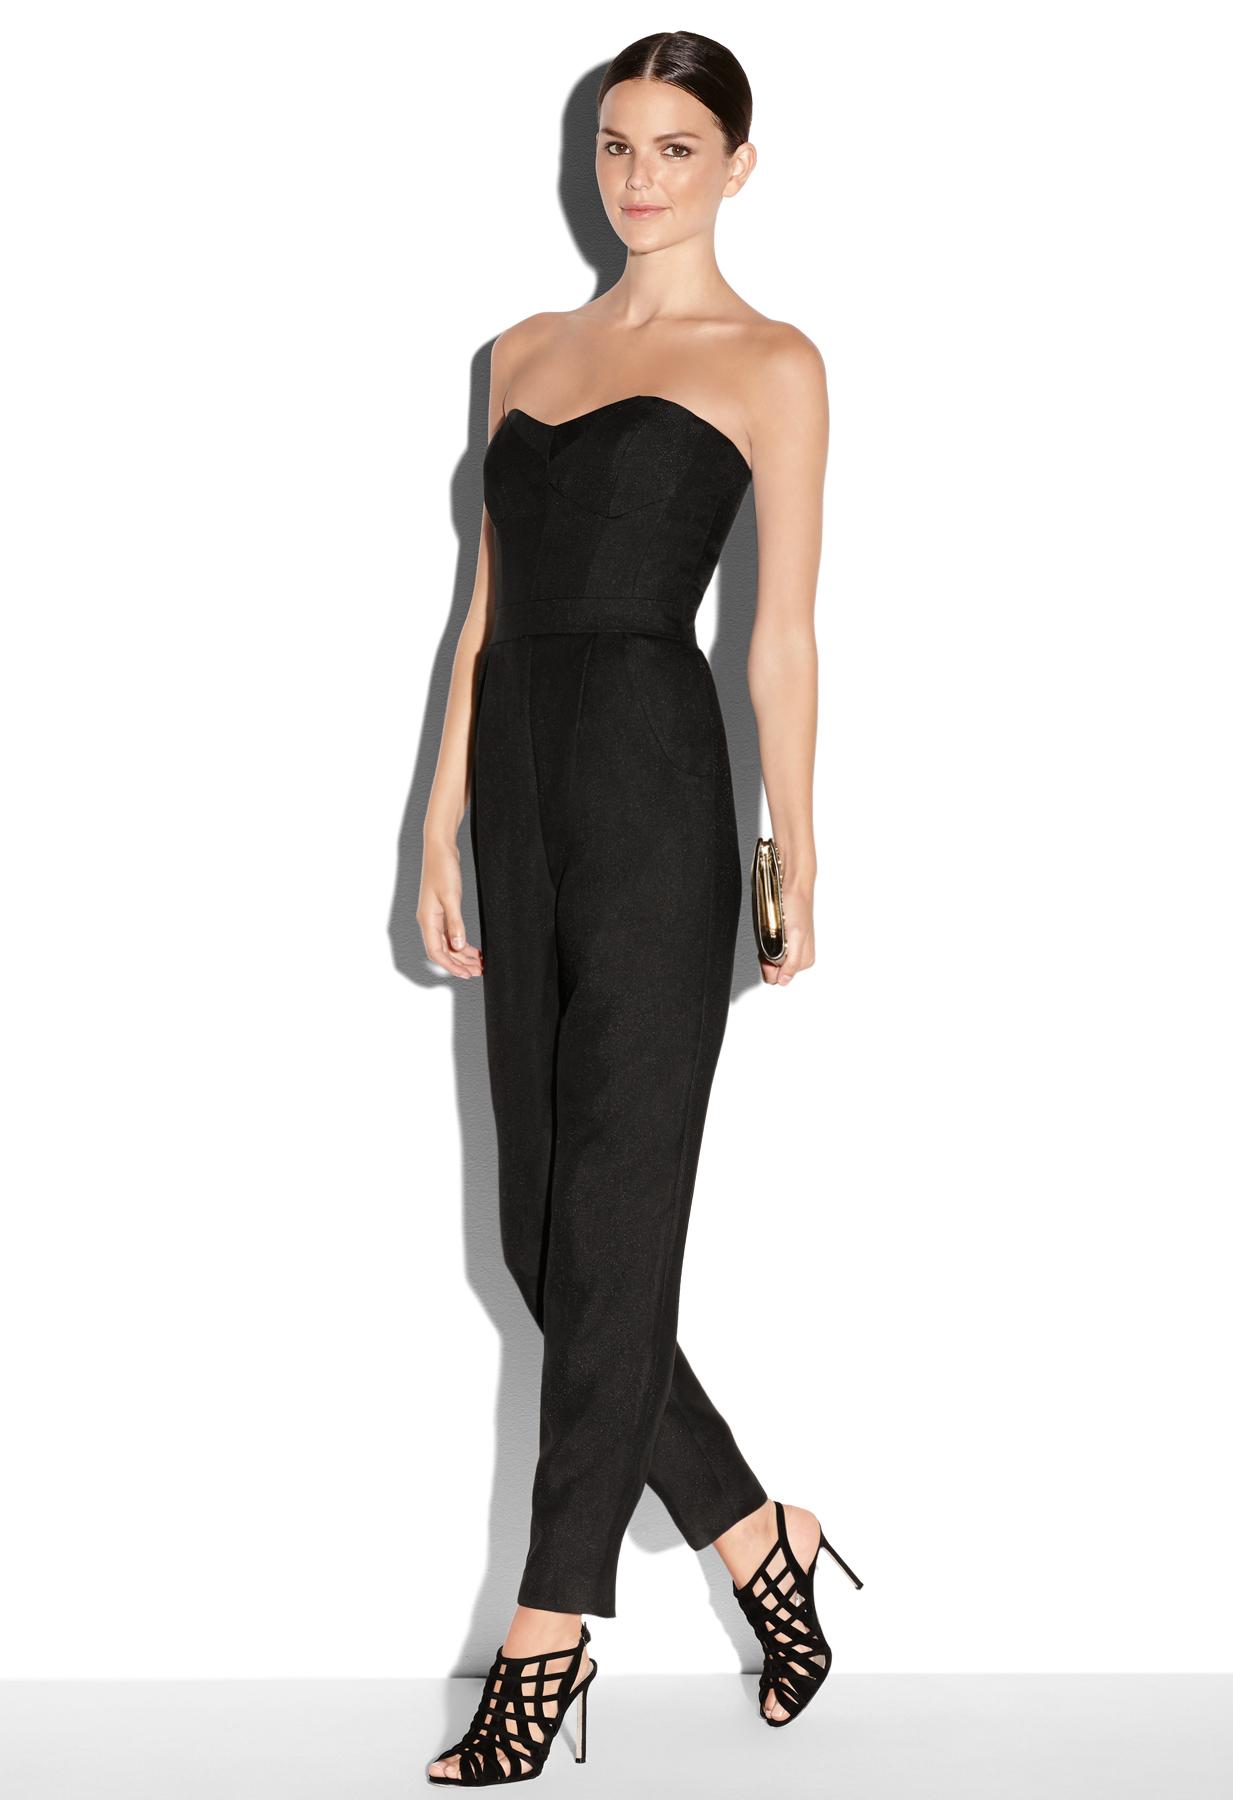 424a9887897e Lyst - MILLY Bustier Jumpsuit in Black